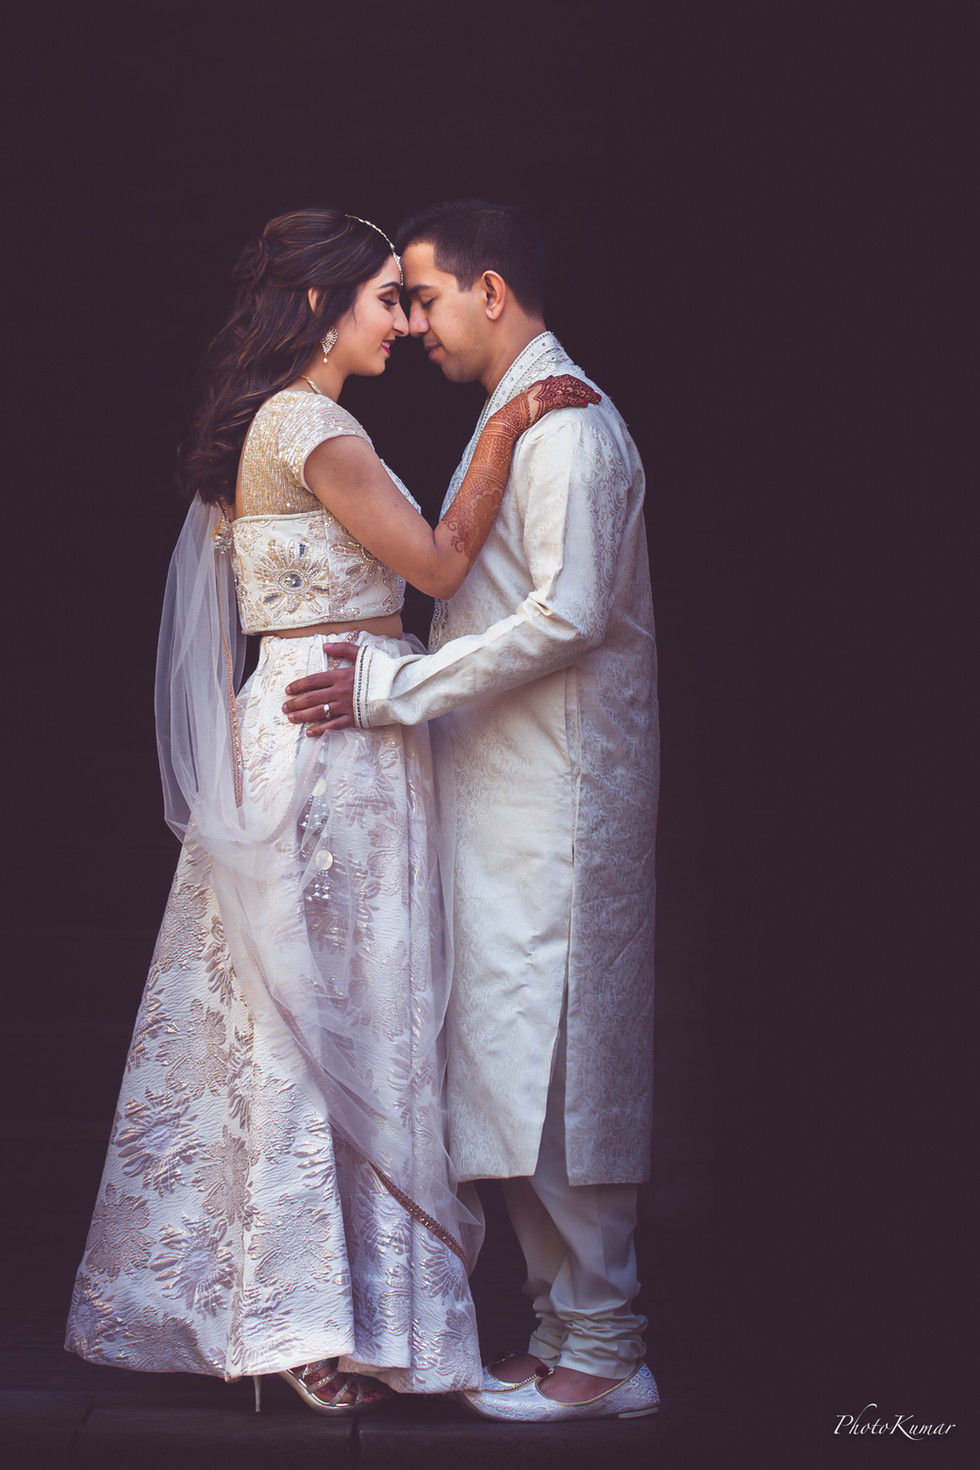 Sonia and Zariyan -PhotoKumar wedding photography -Mahendhi (1 of 1)-10.jpg